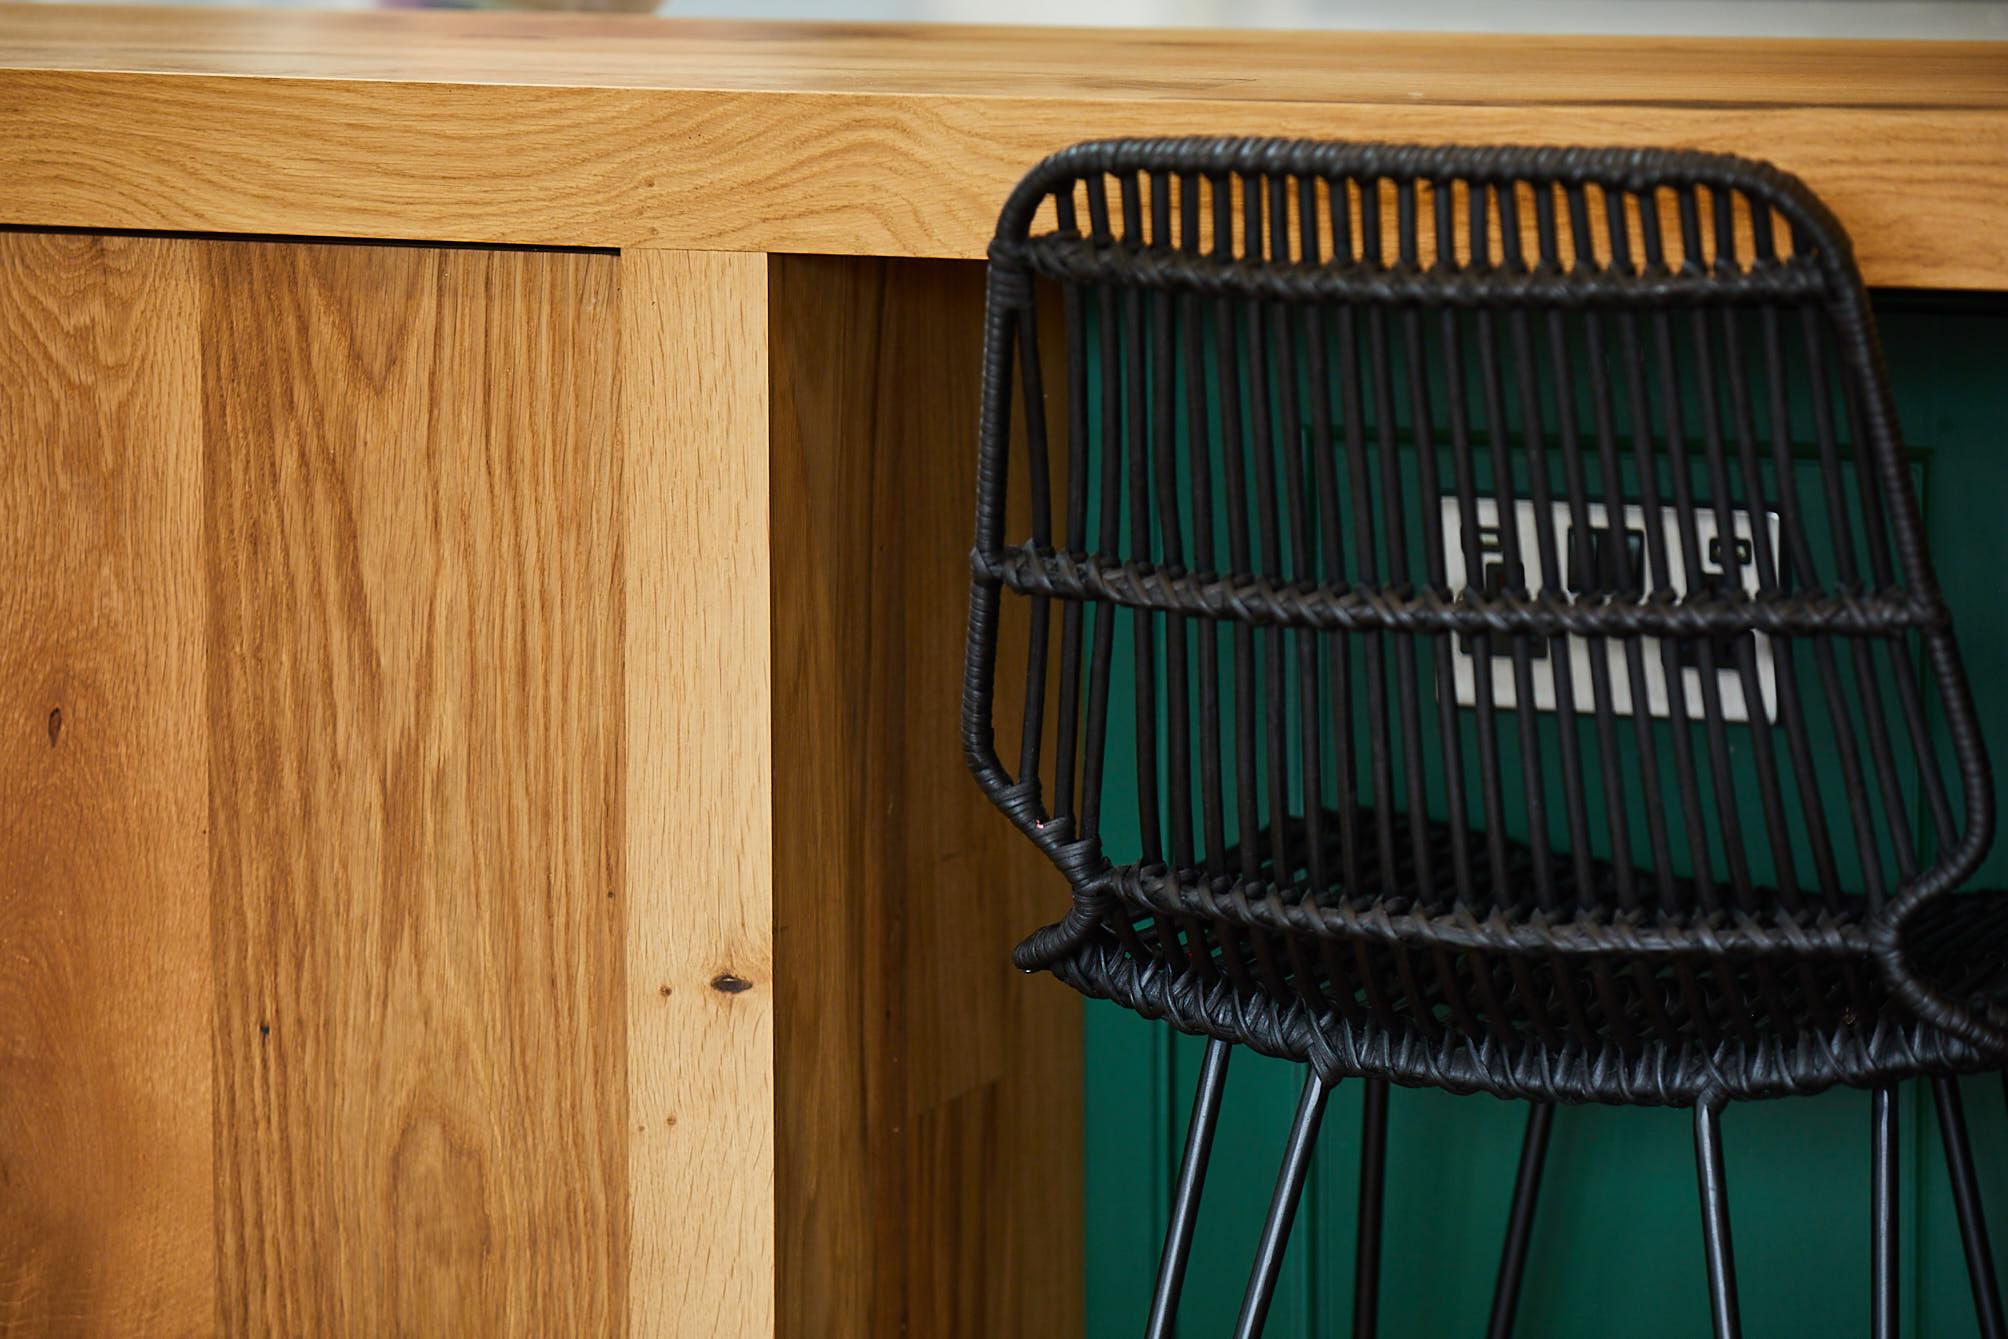 Black barstool backrest sits next to French oak kitchen cabinet